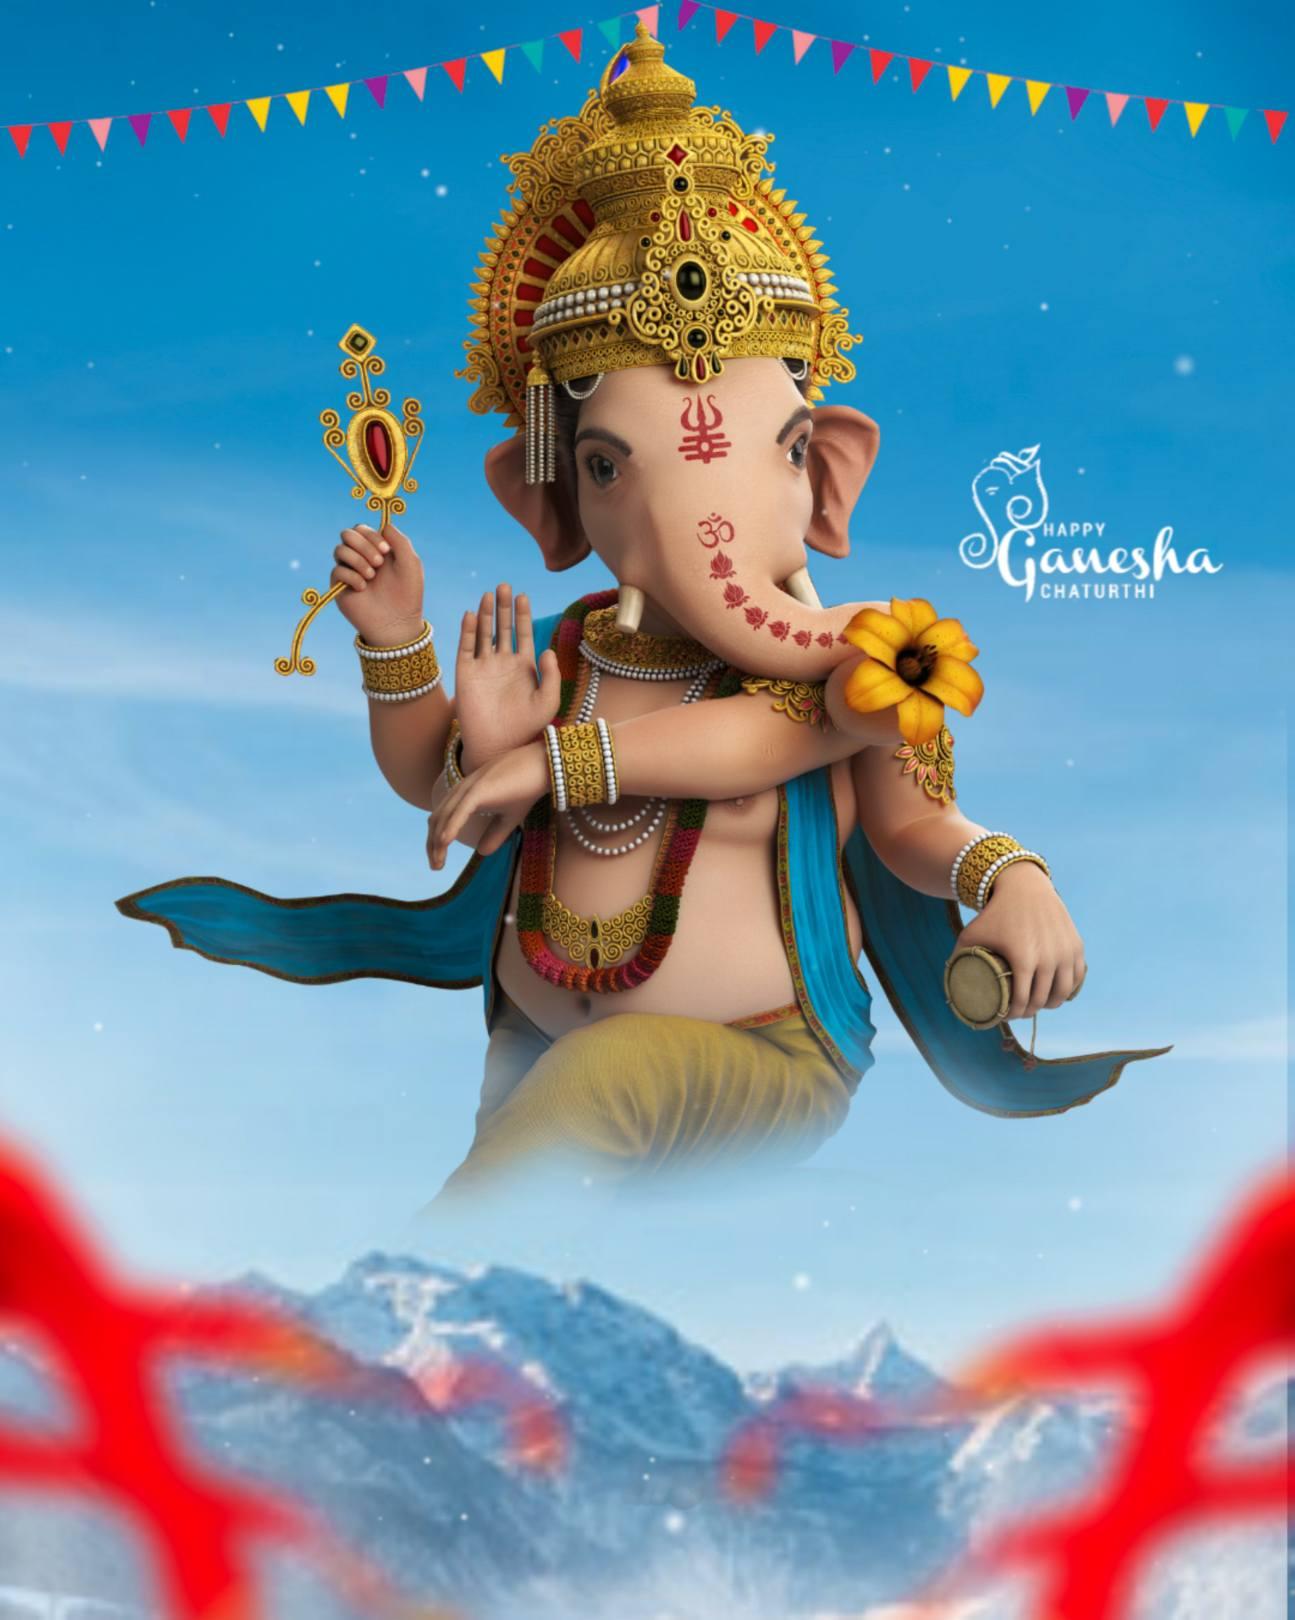 Ganesh editing background || Ganpati banner background